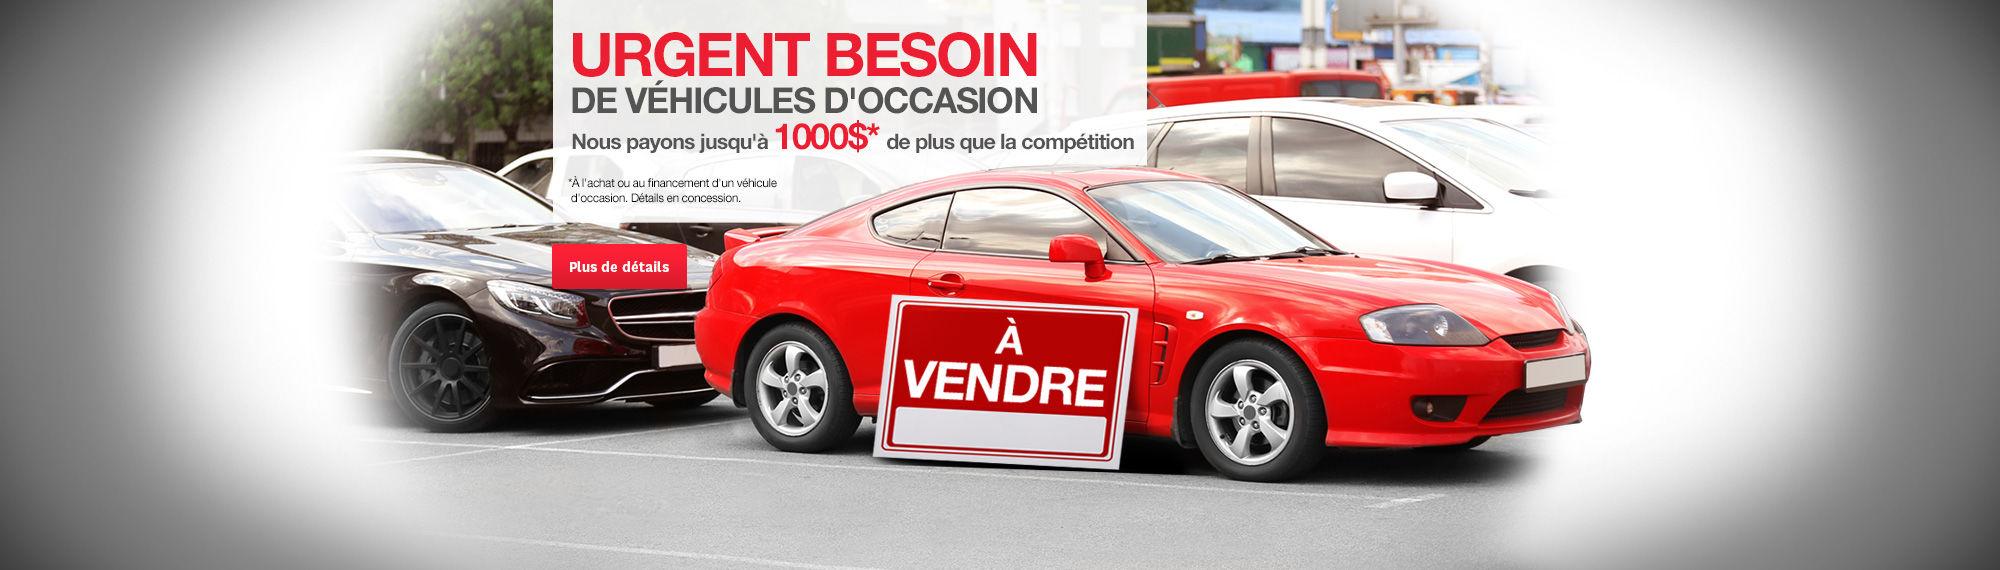 Occasion En Or Le Plus Grand Choix De Vehicules Usages Au Quebec >> Concessionaire Honda A Salaberry De Valleyfield Valleyfield Honda